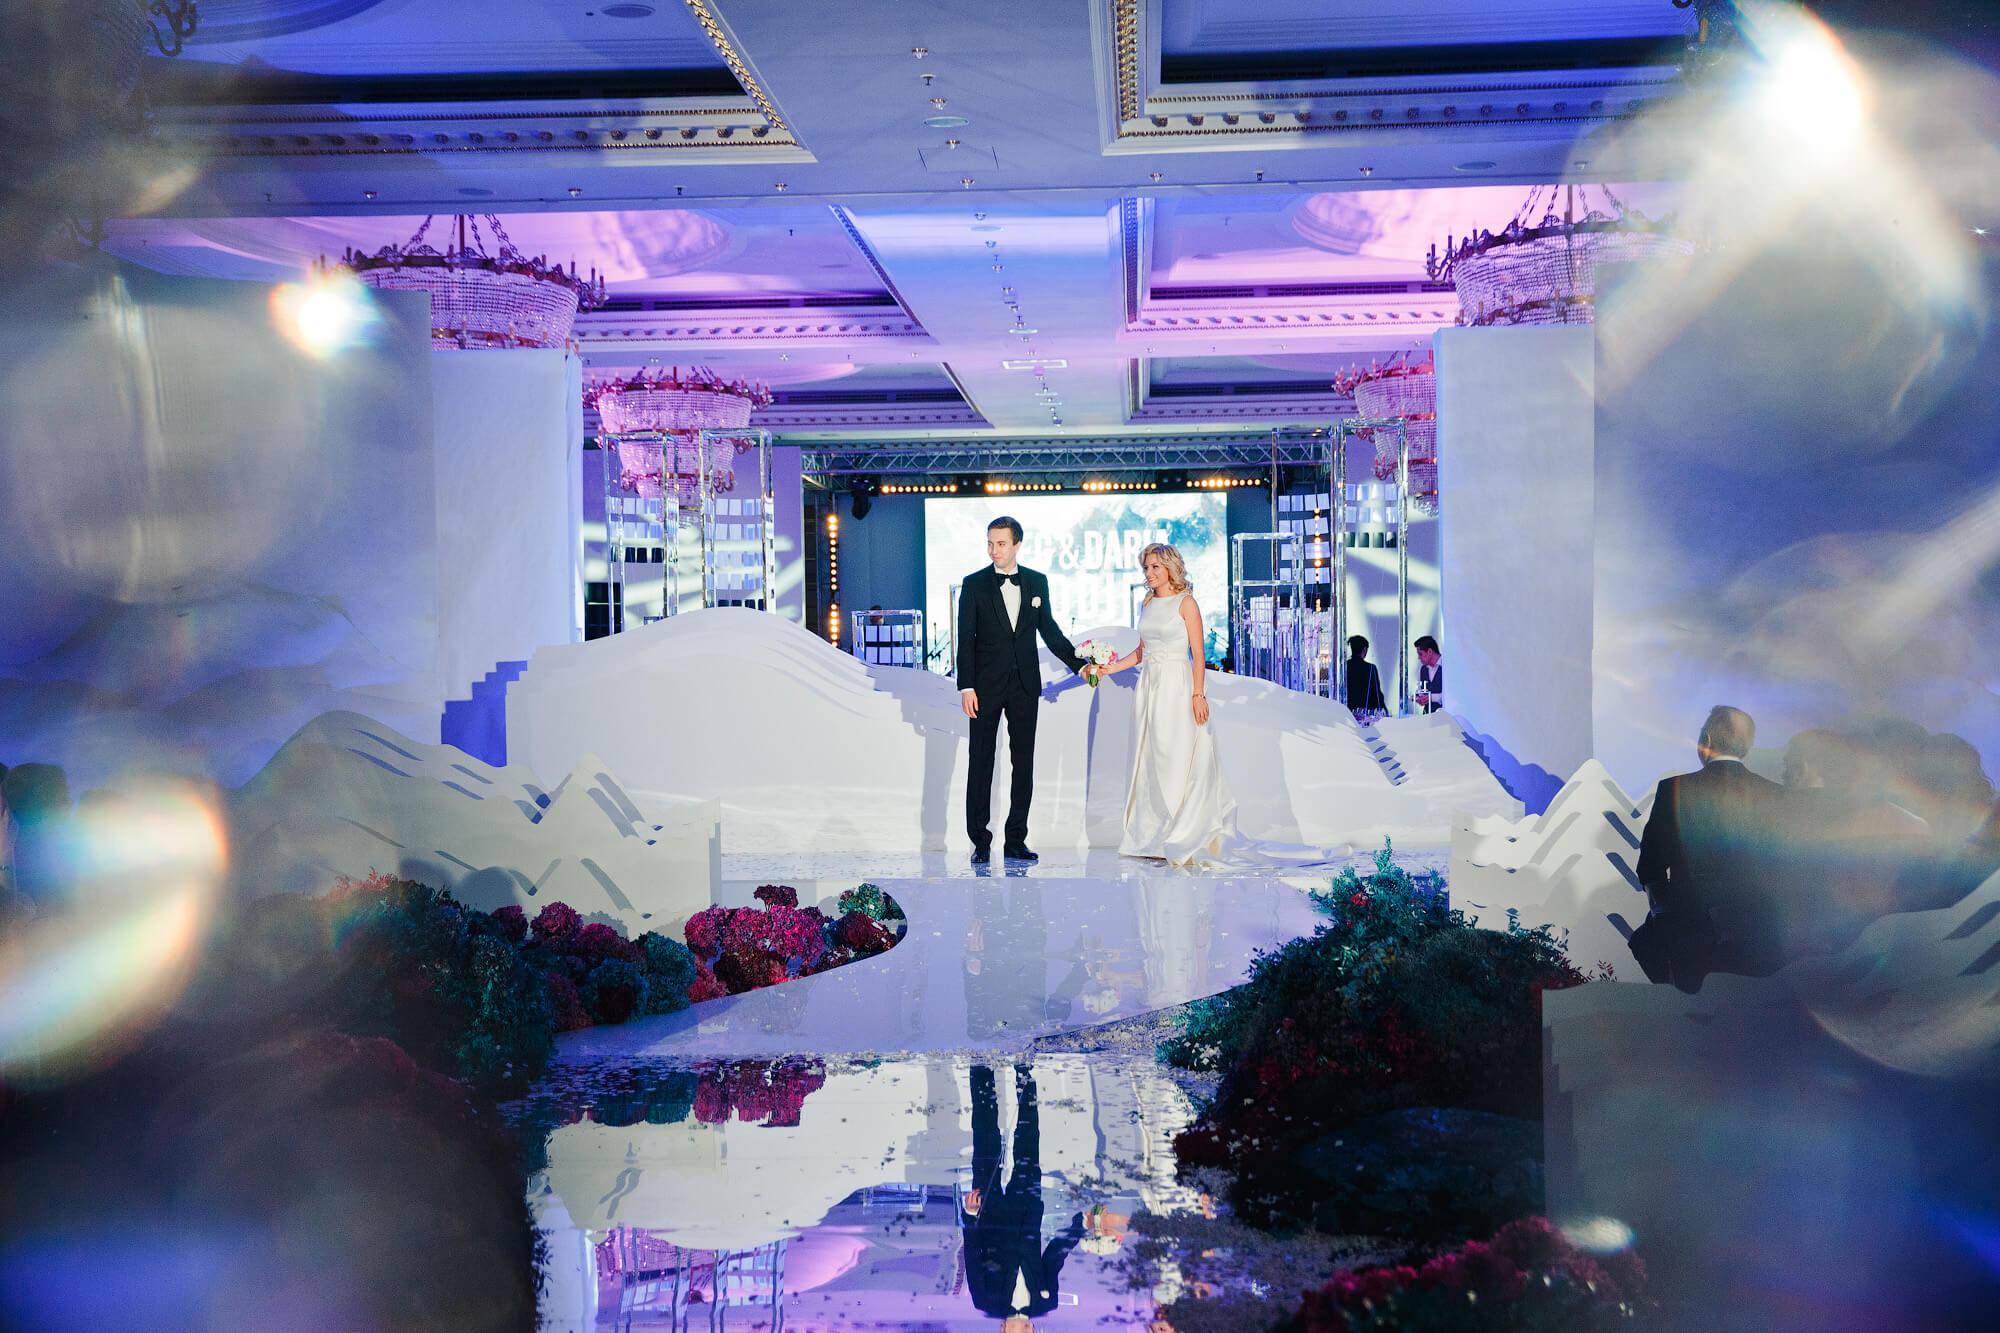 Свадебная церемония в Ритц Карлтон. Свадьбе в отеле Ритц Карлтон